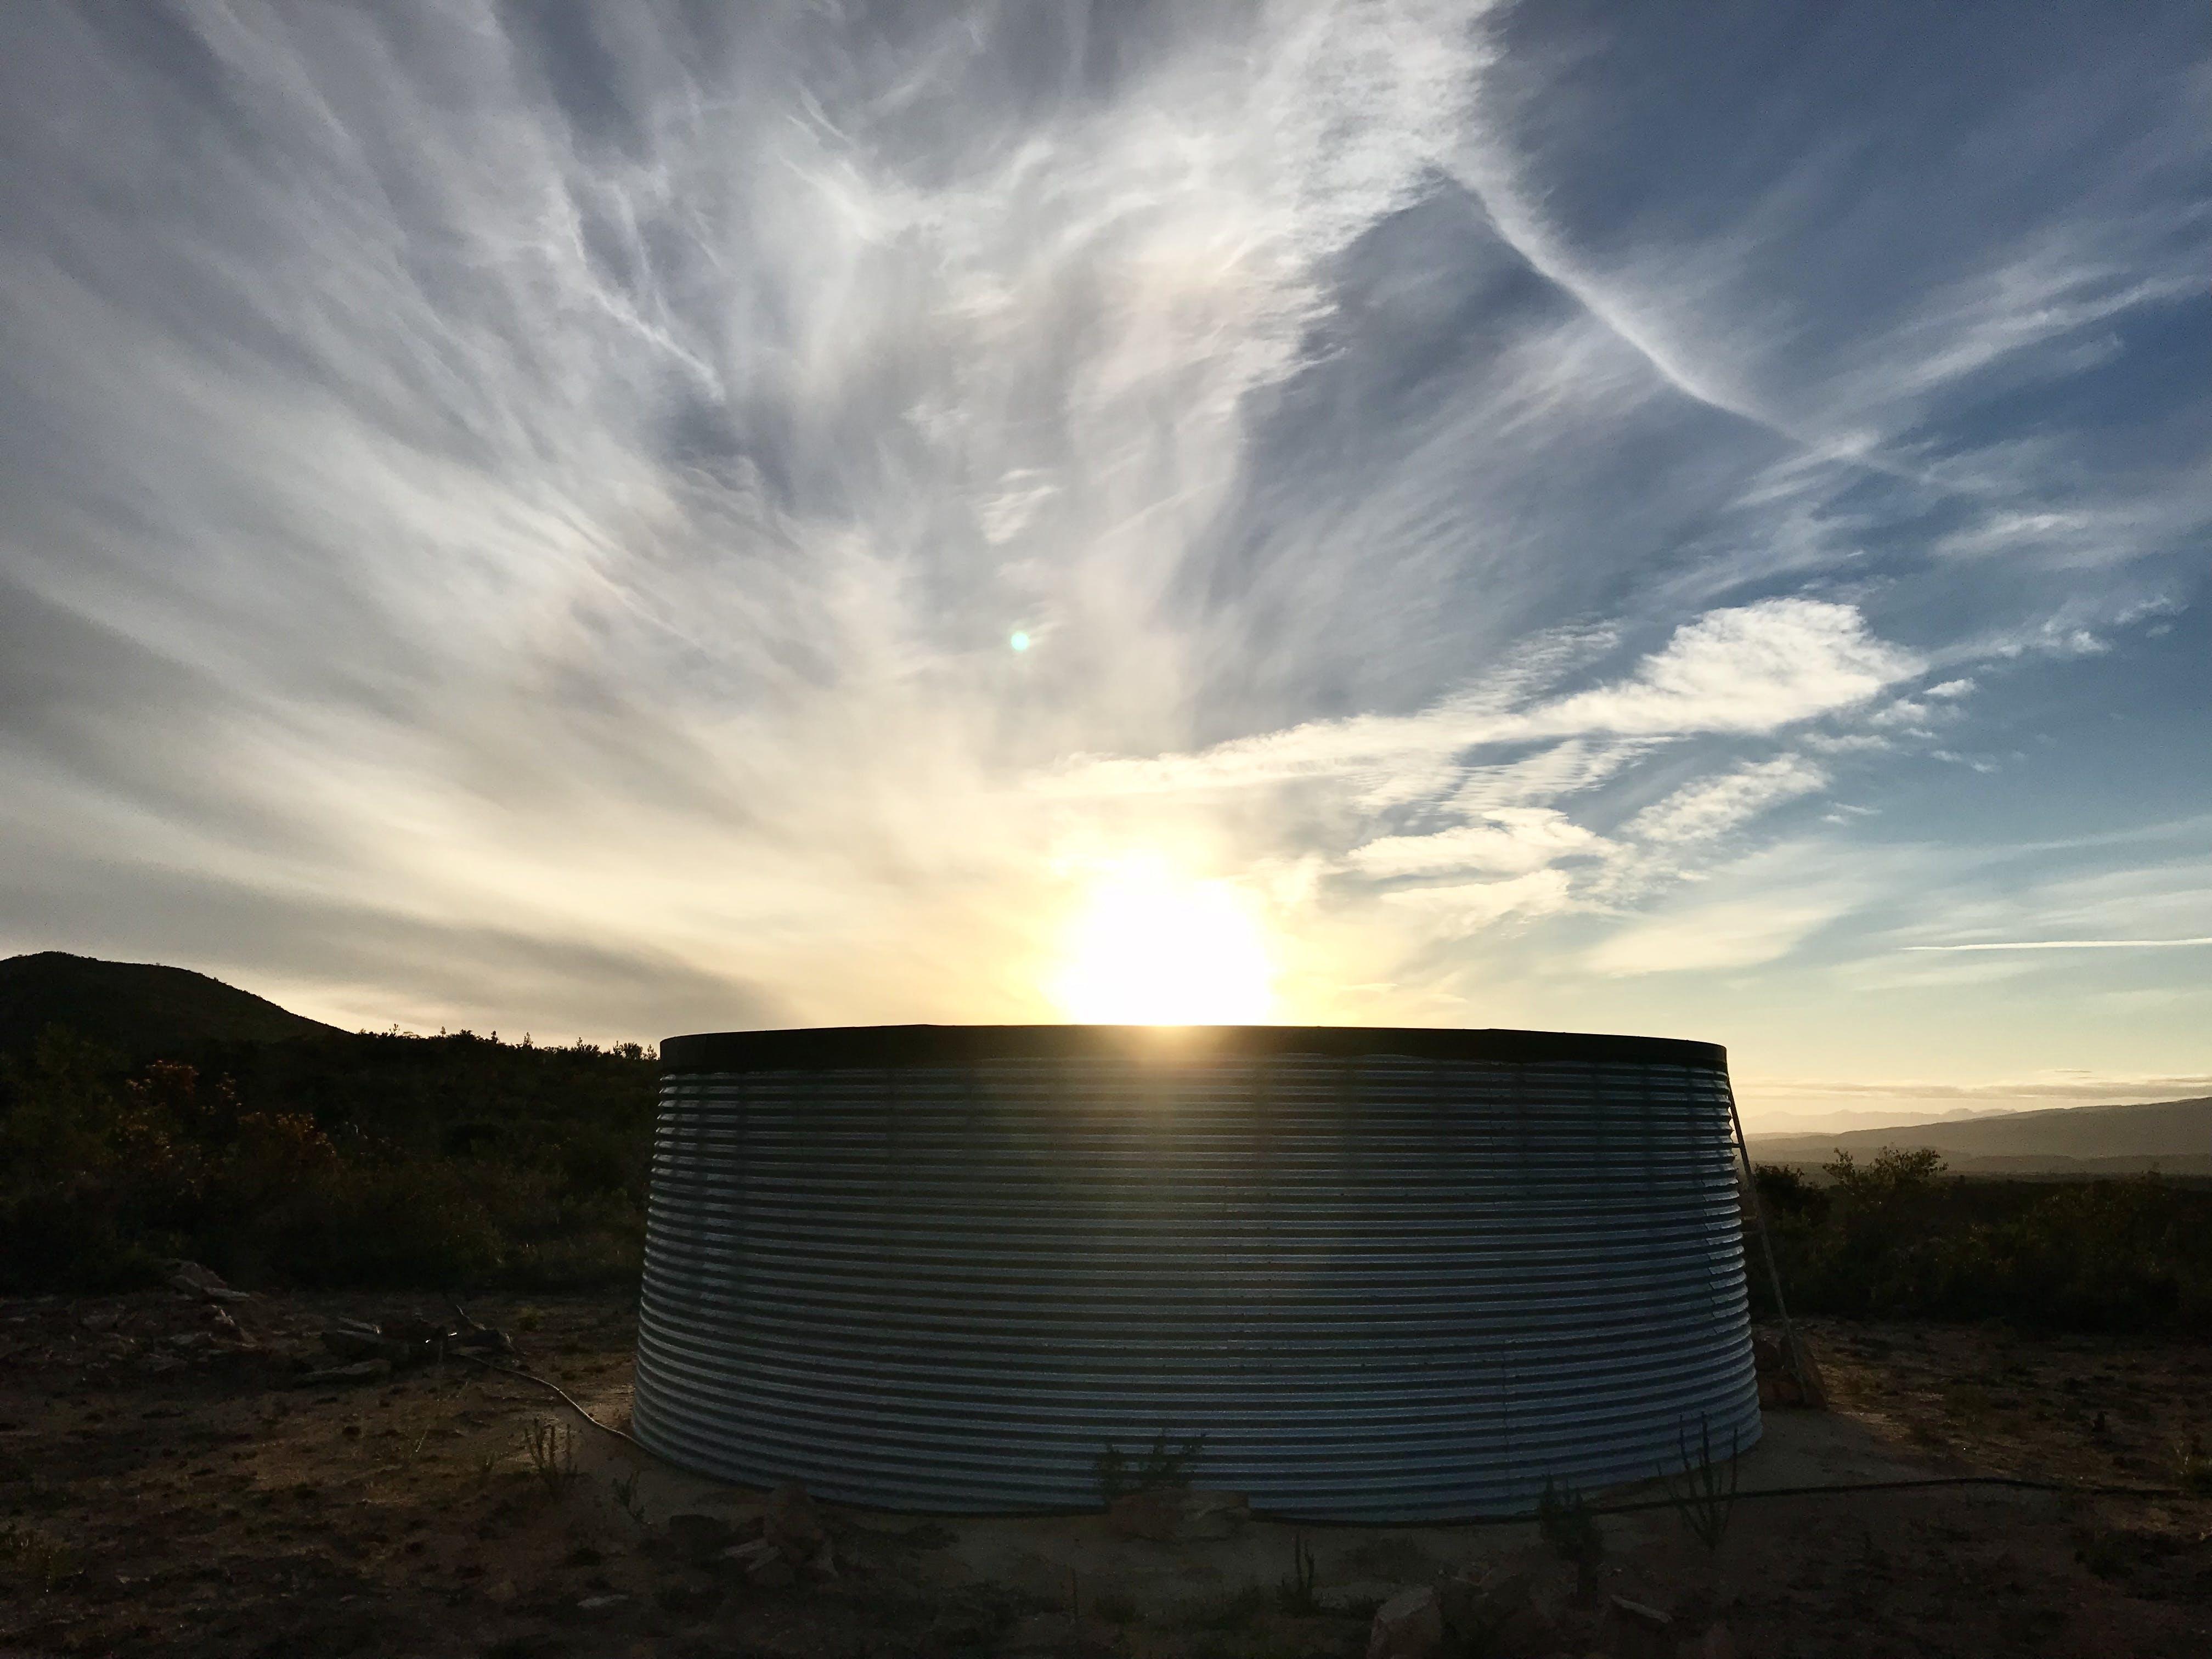 Free stock photo of clouds, dam, farm, golden sunset